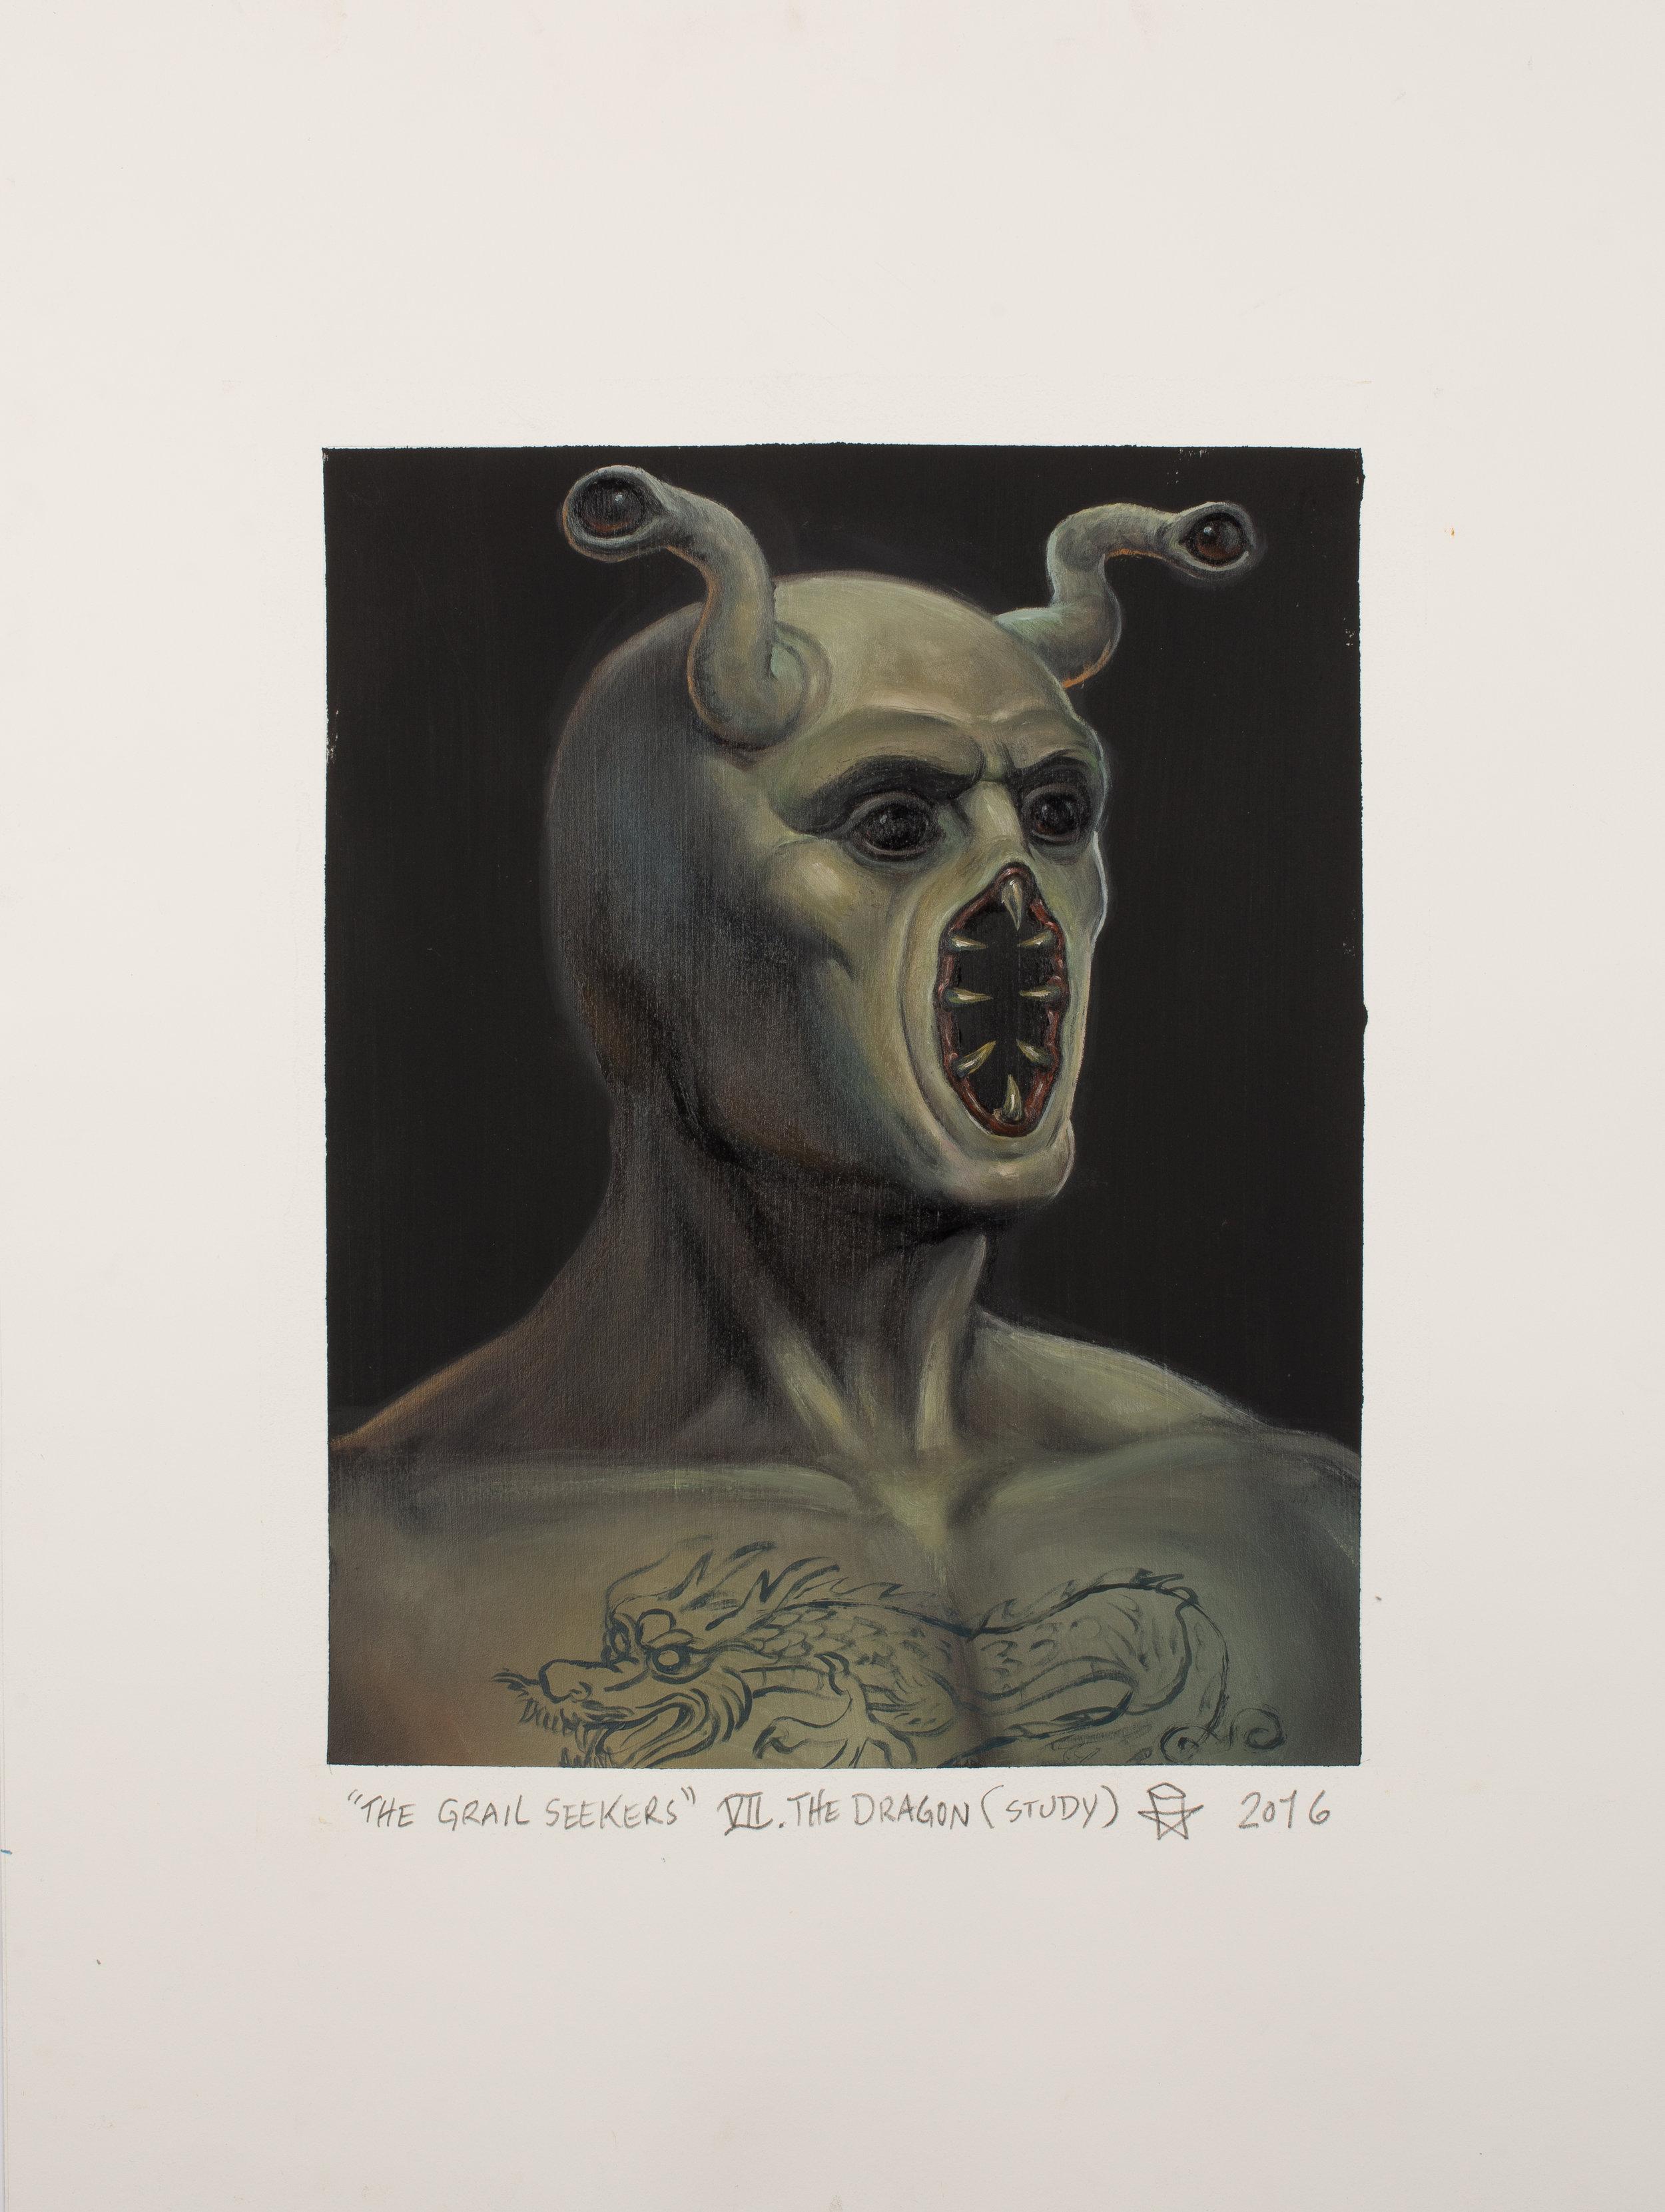 Ulrich-dragon.study.jpg